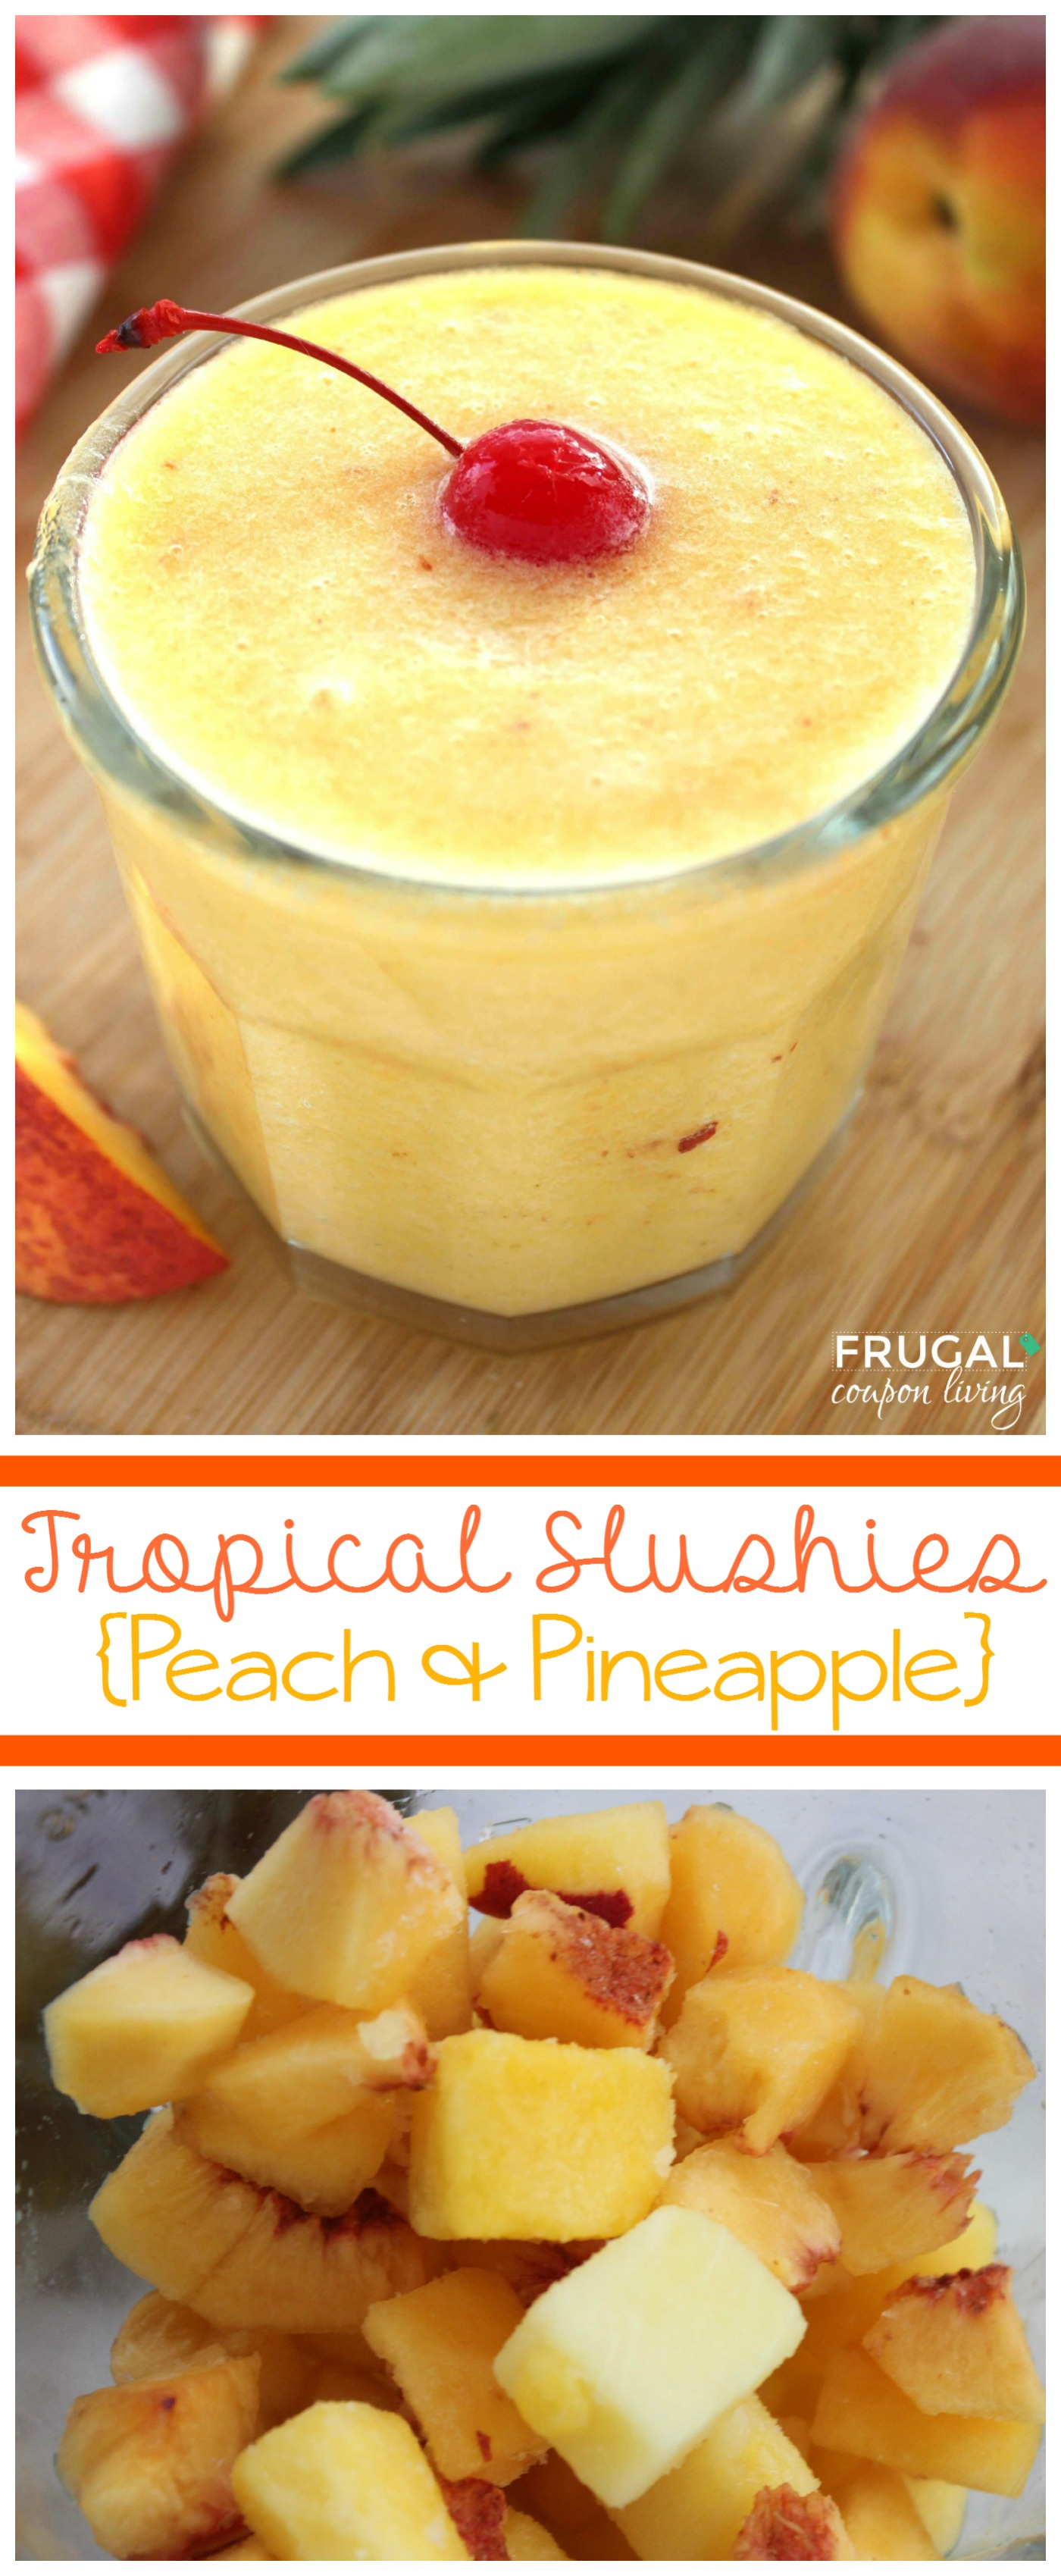 Tropical-slushies-peach-pineapple-Collage-vertical